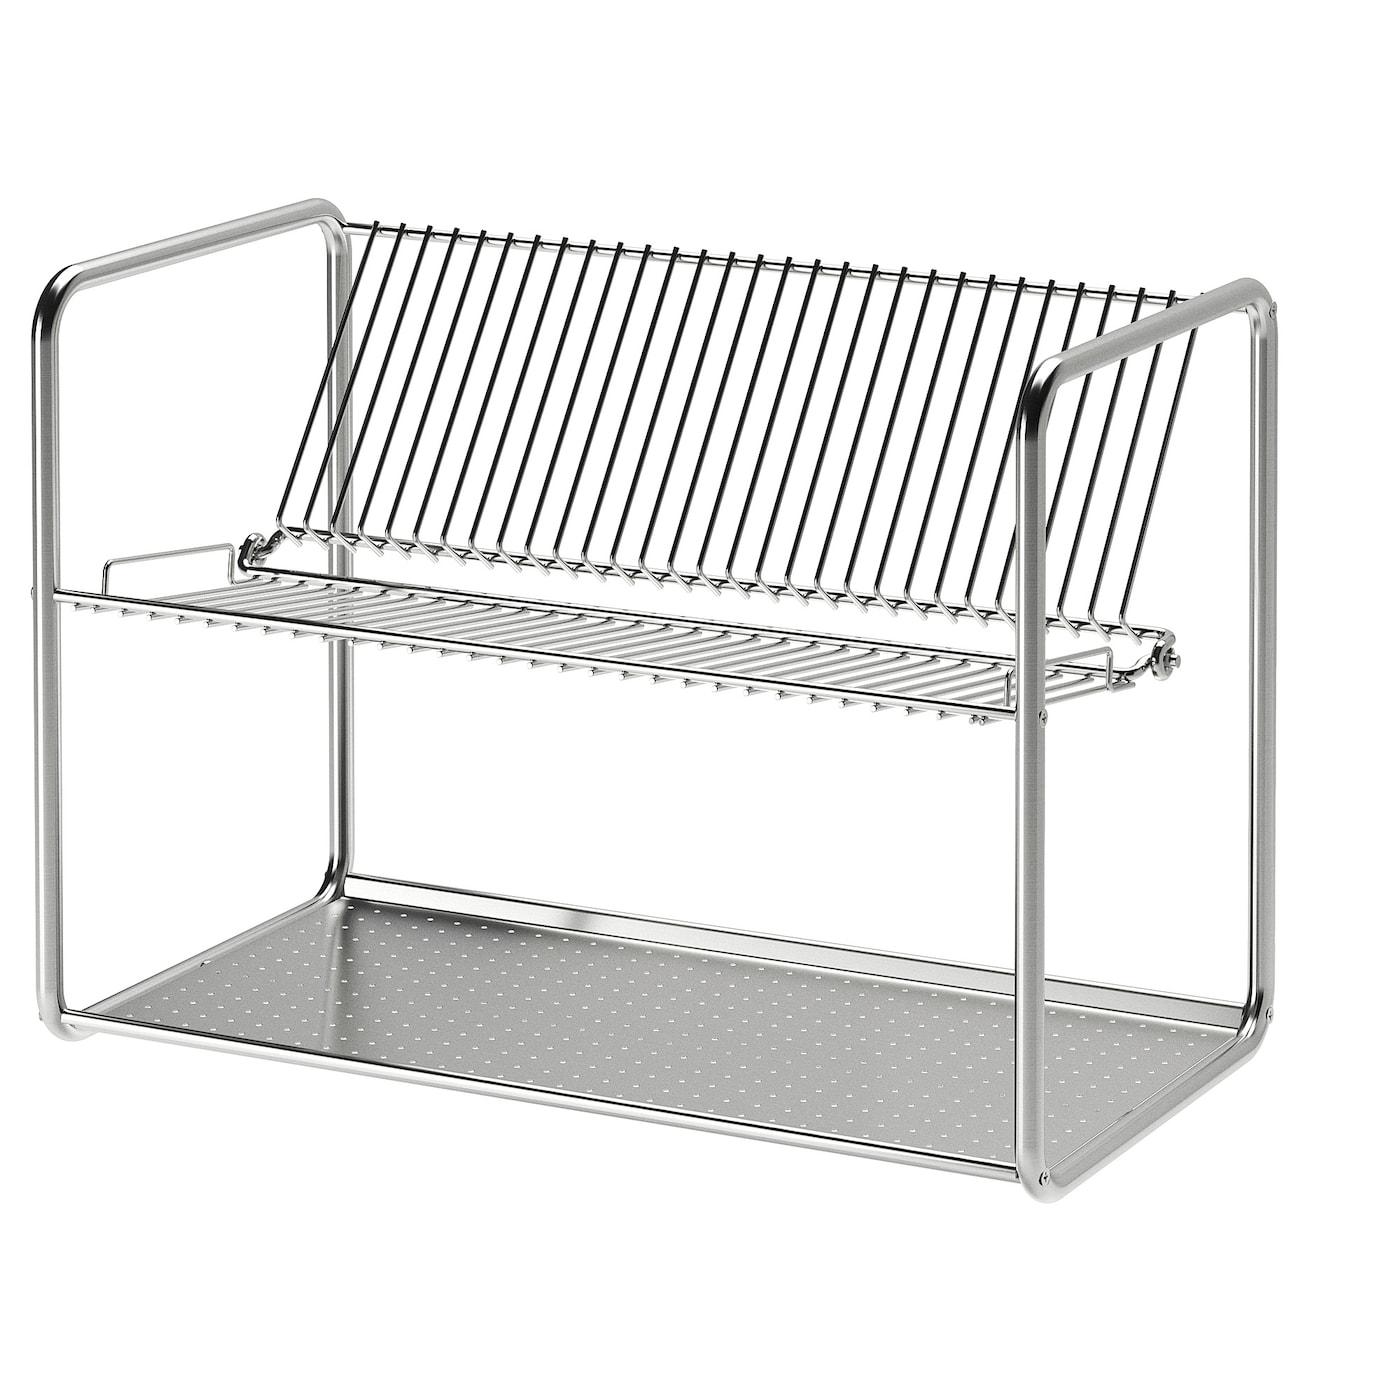 IKEA ORDNING STAINLESS STEEL CUTLERY UTENSILS STAND HOLDER DRAINER